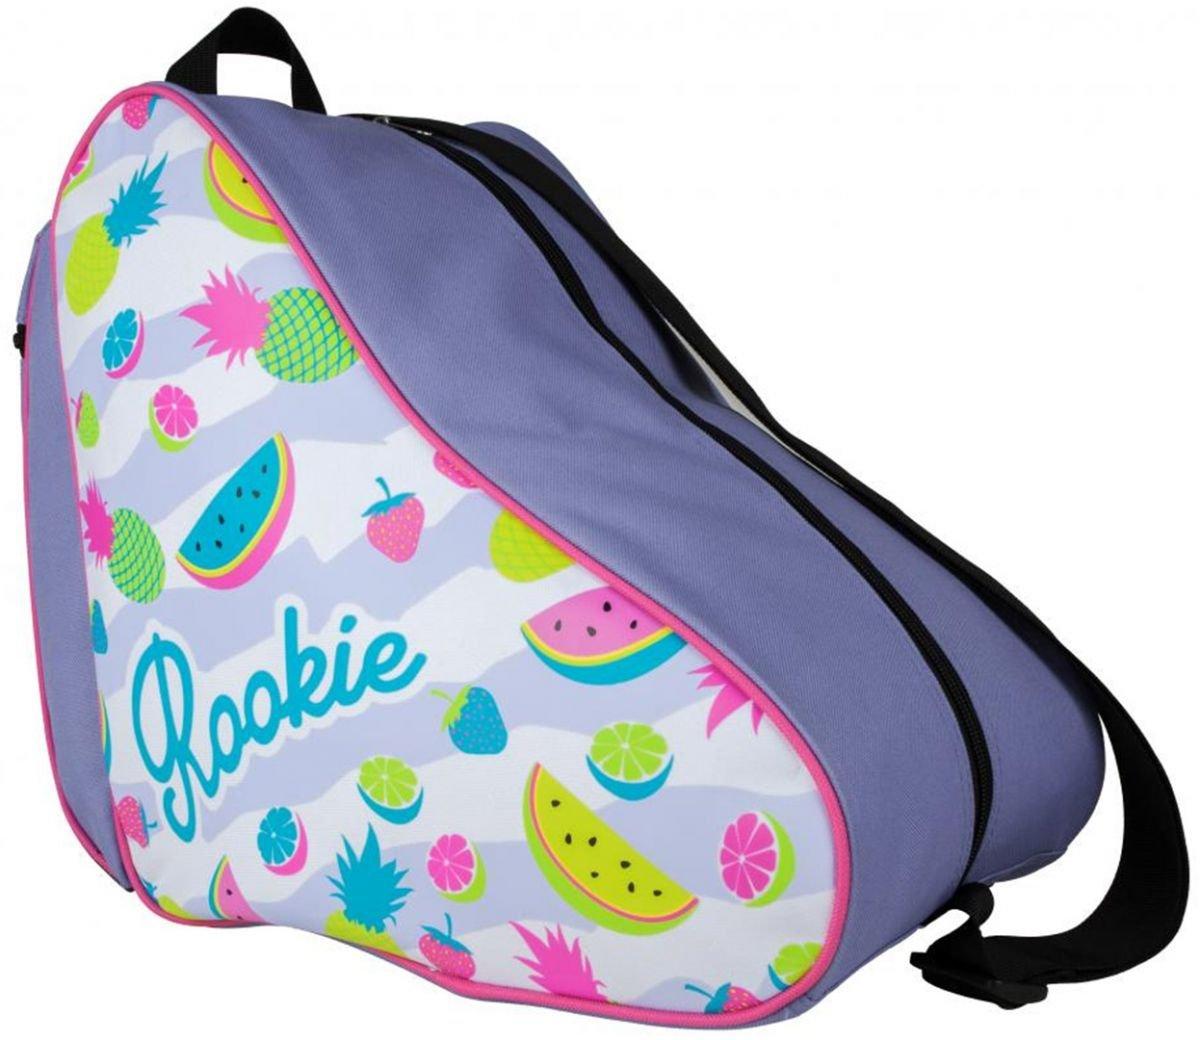 ROOKIE Fruit Boot Bag, Mochila Unisex Adulto, Multicolor (White/Multi), 15 x 17 x 25 cm RKE-BAG-0008